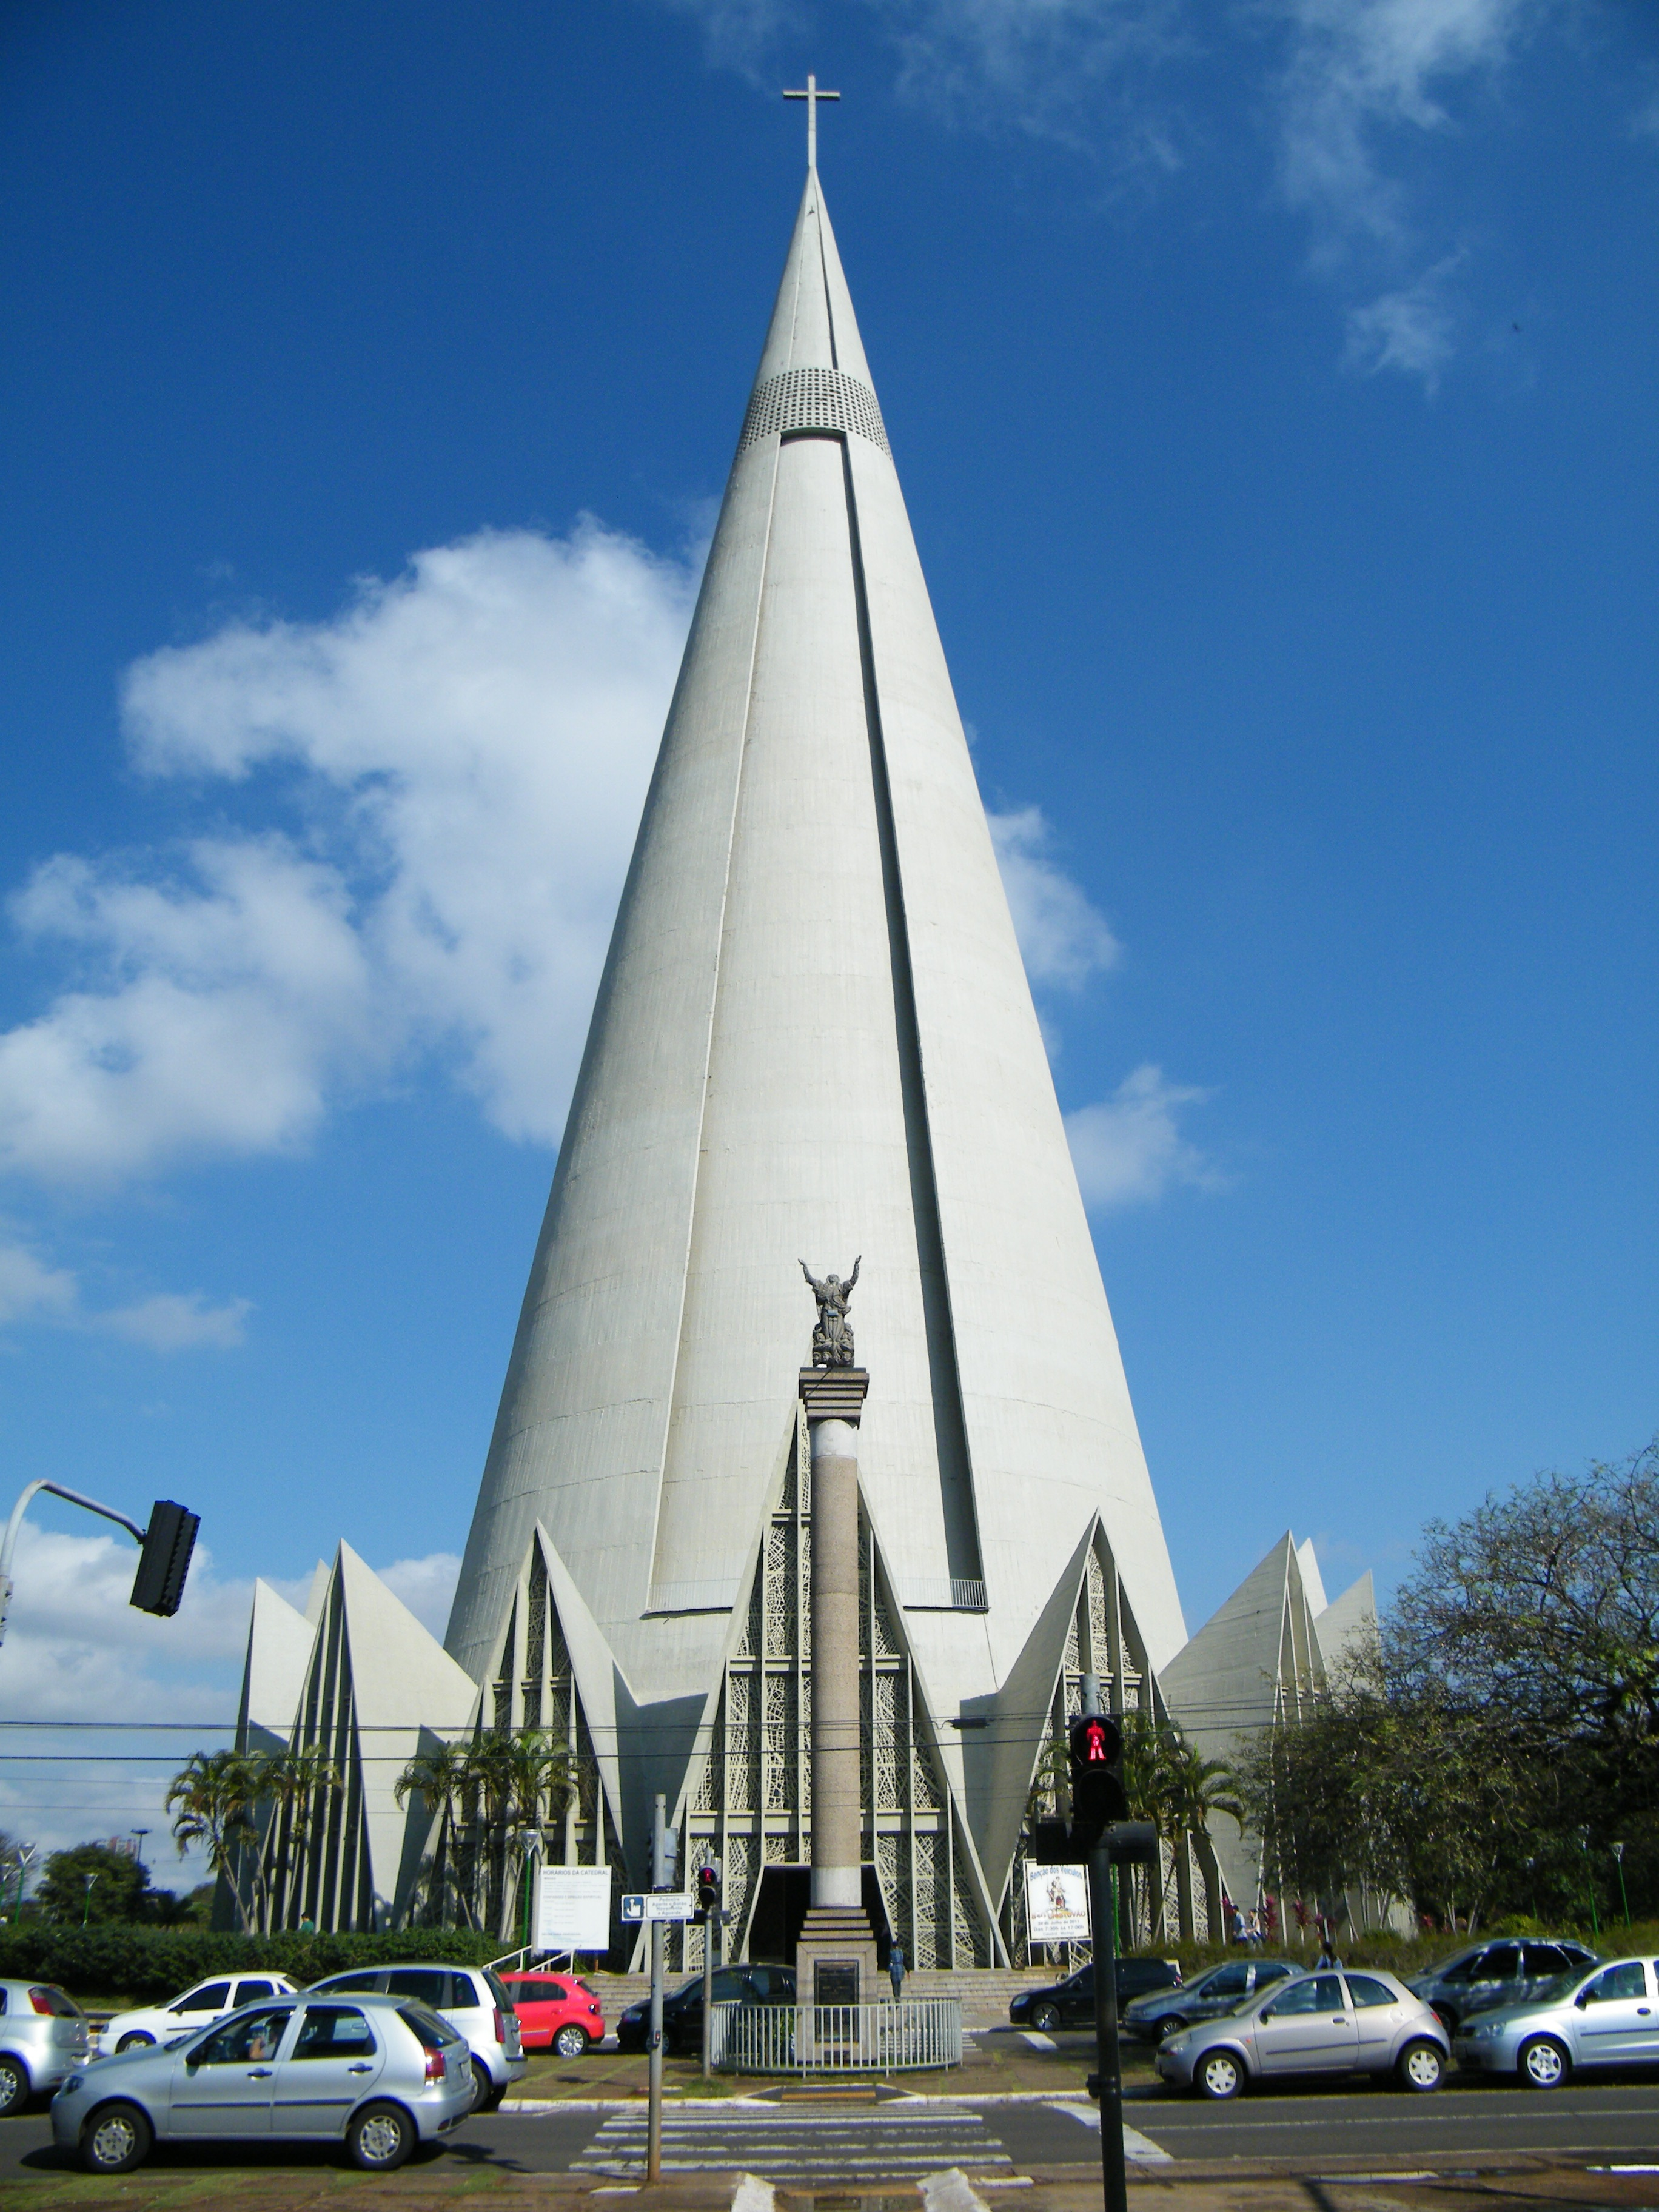 Armarios Sin Puertas Baratos ~ Catedral Nossa Senhora da Glória u2013 Maringá u2013 Paraná u2013 Brasil crscalderon